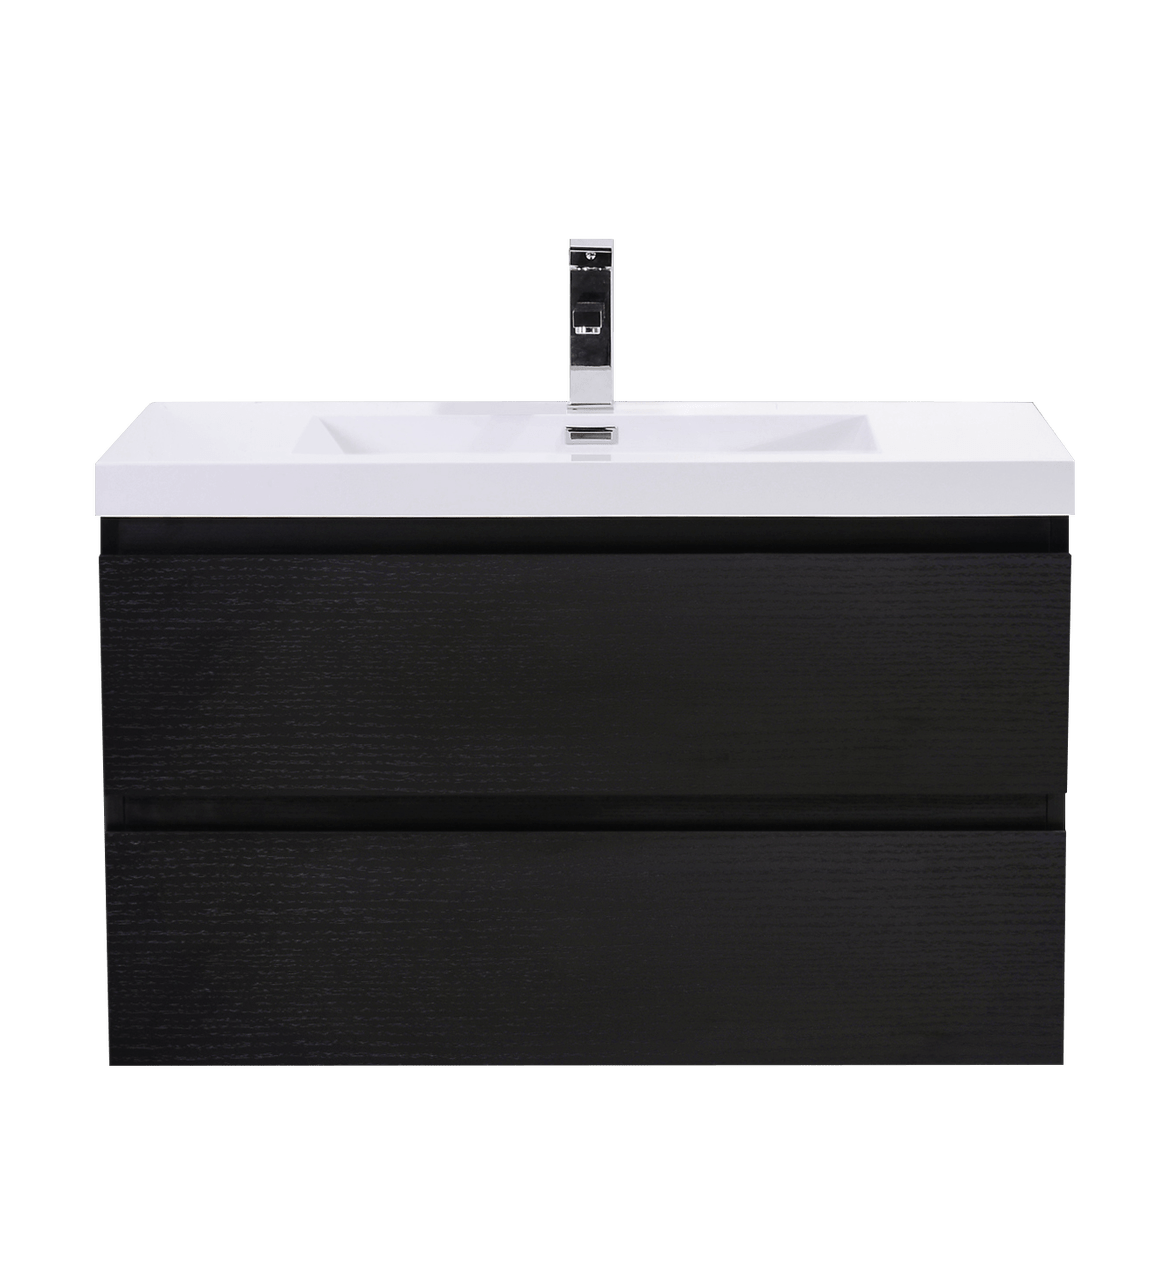 moreno mob 36 black wall mounted modern bathroom vanity with reeinforced acrylic sink